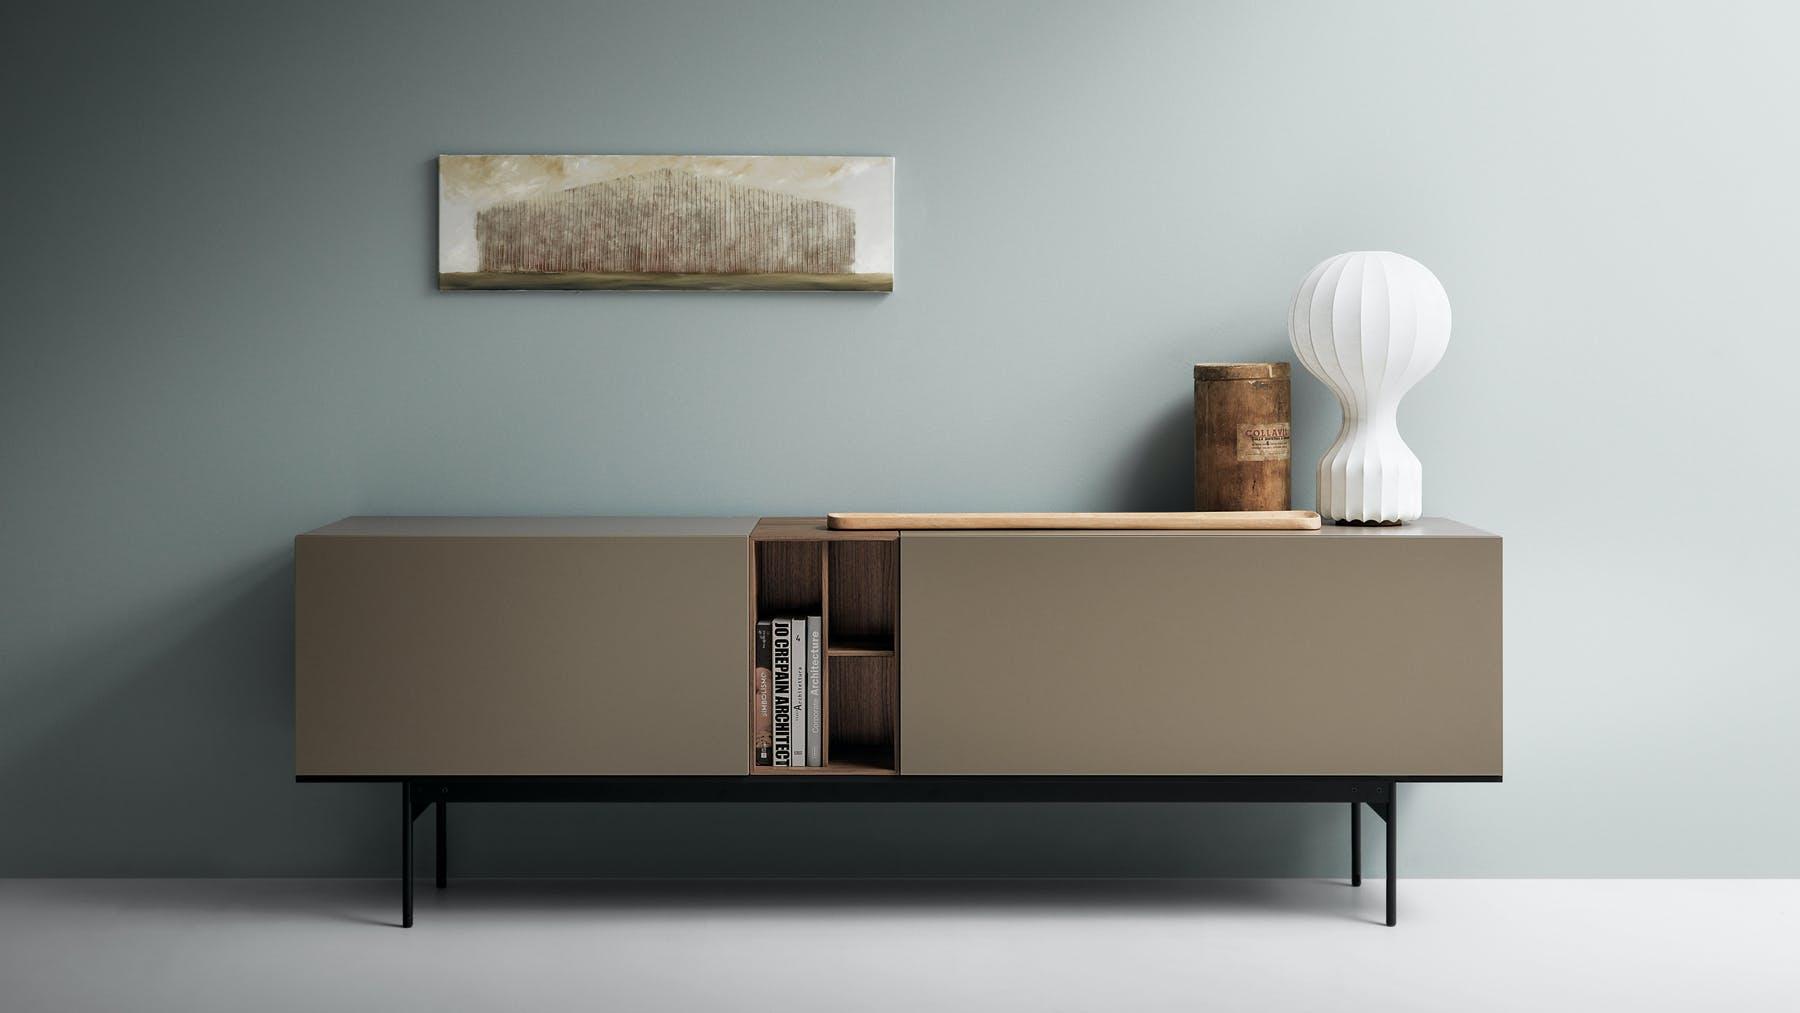 Brick Storage By Caccaro At Haute Living